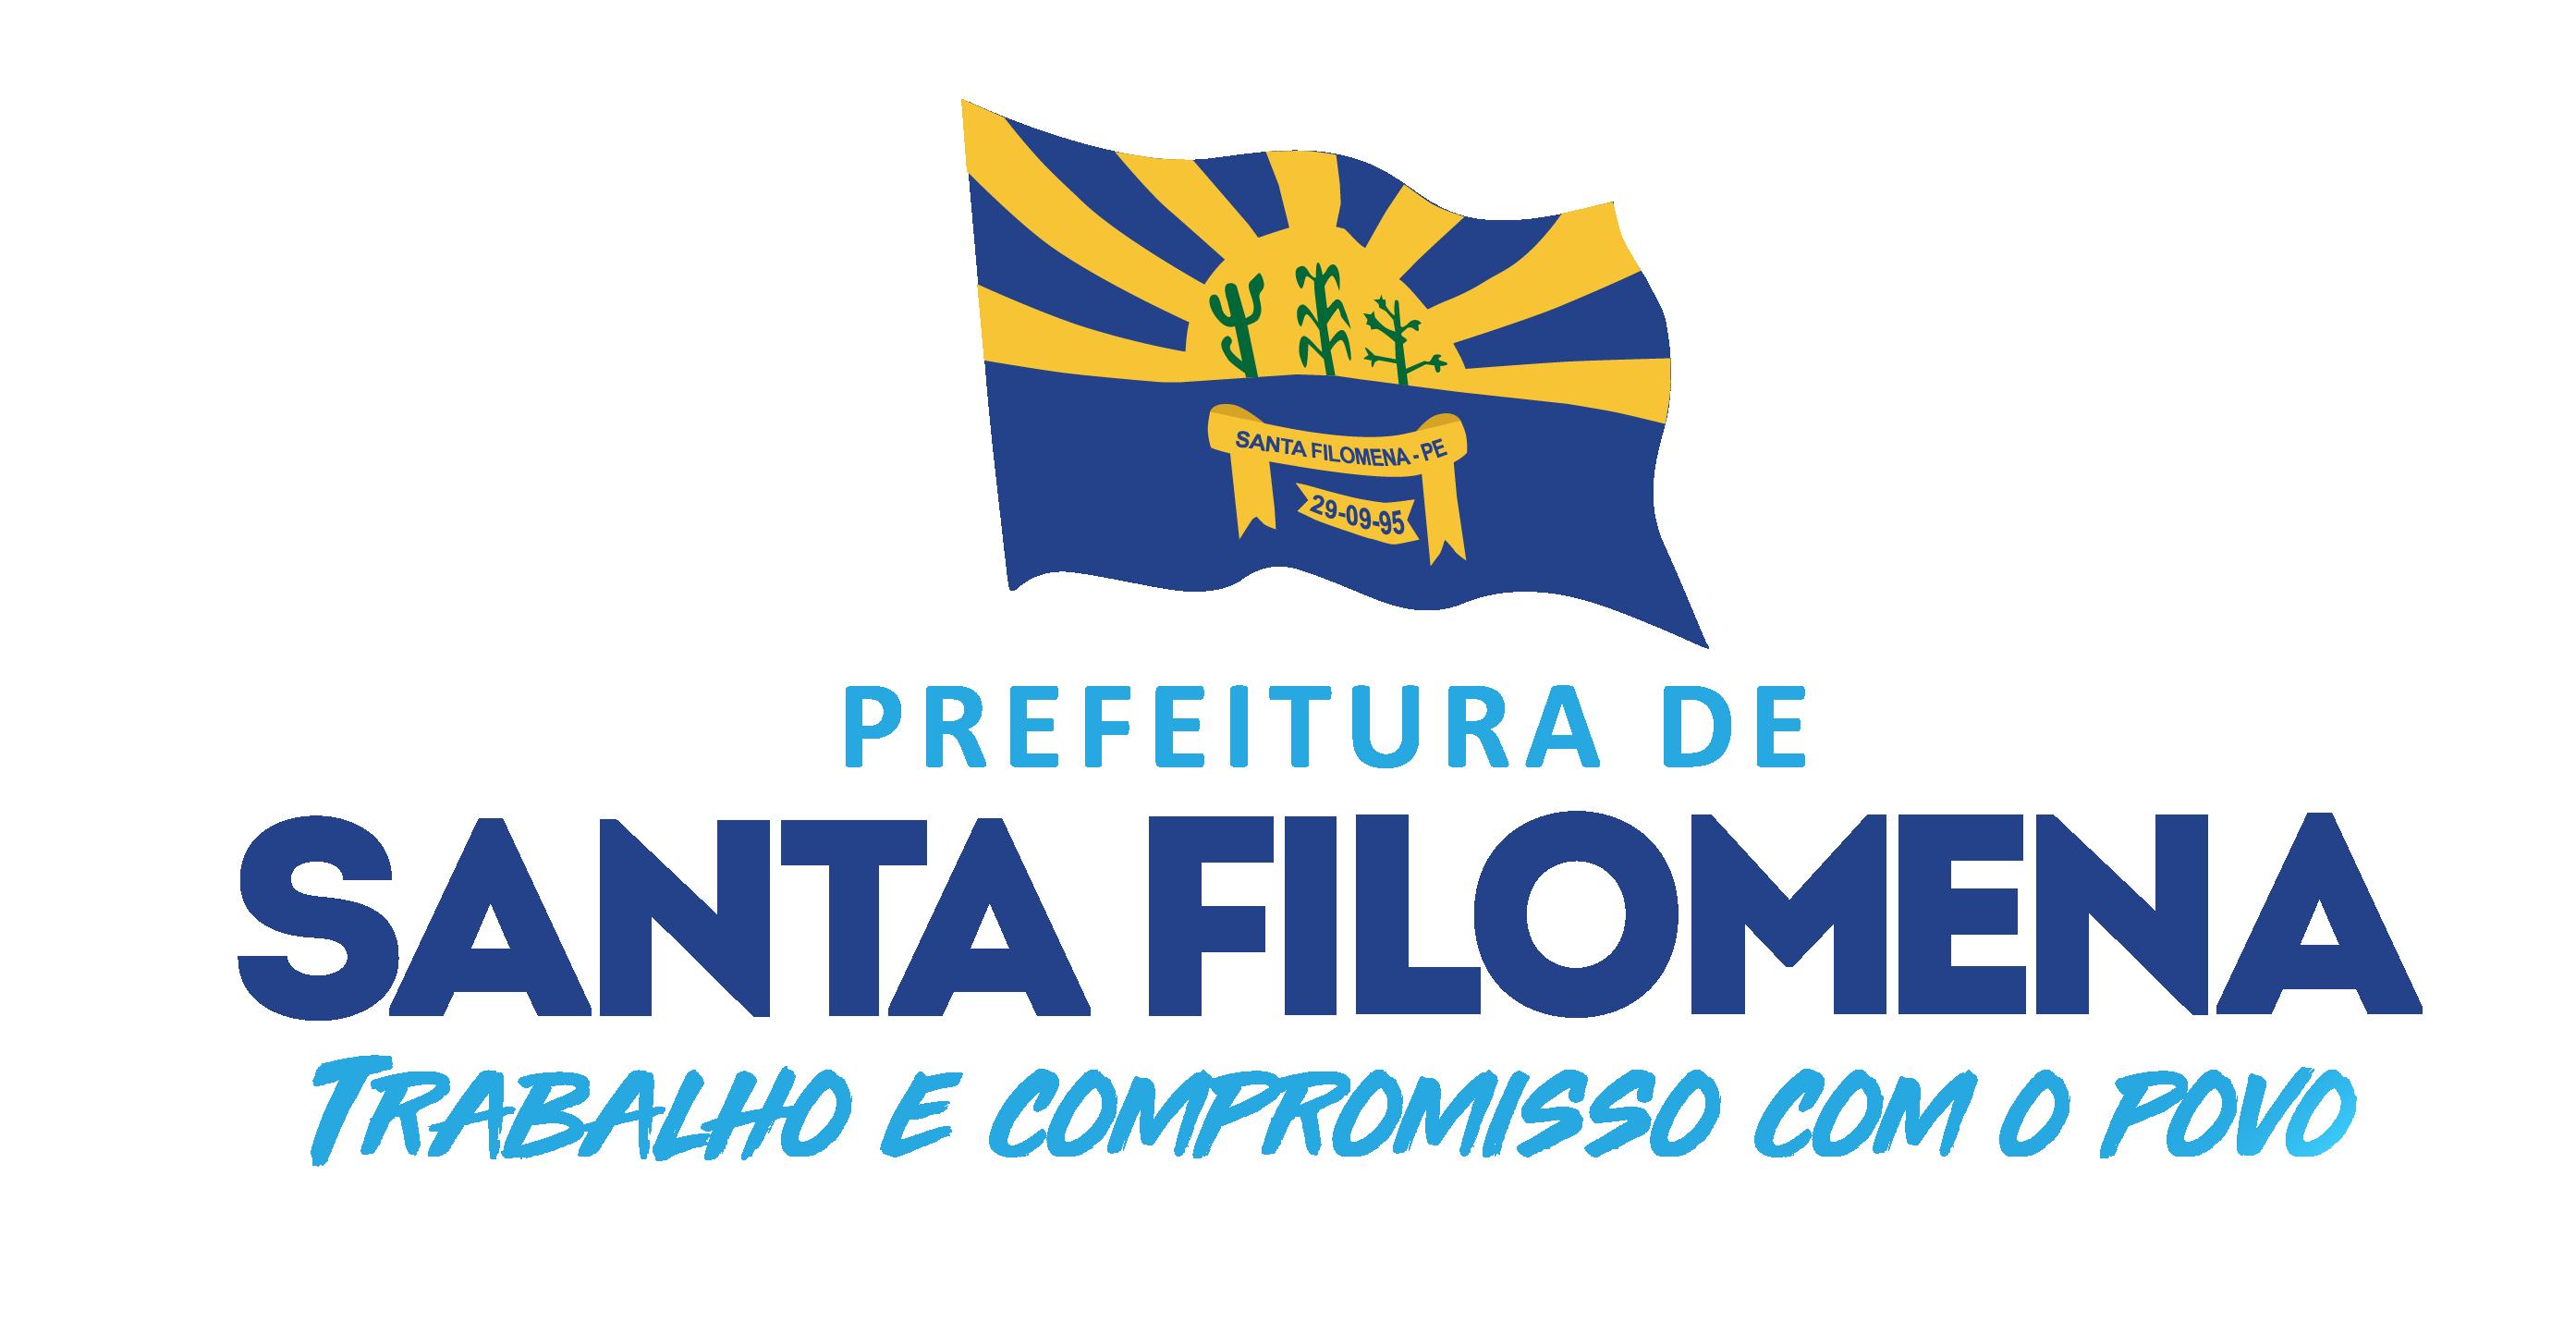 Prefeitura de Santa Filomena Logo